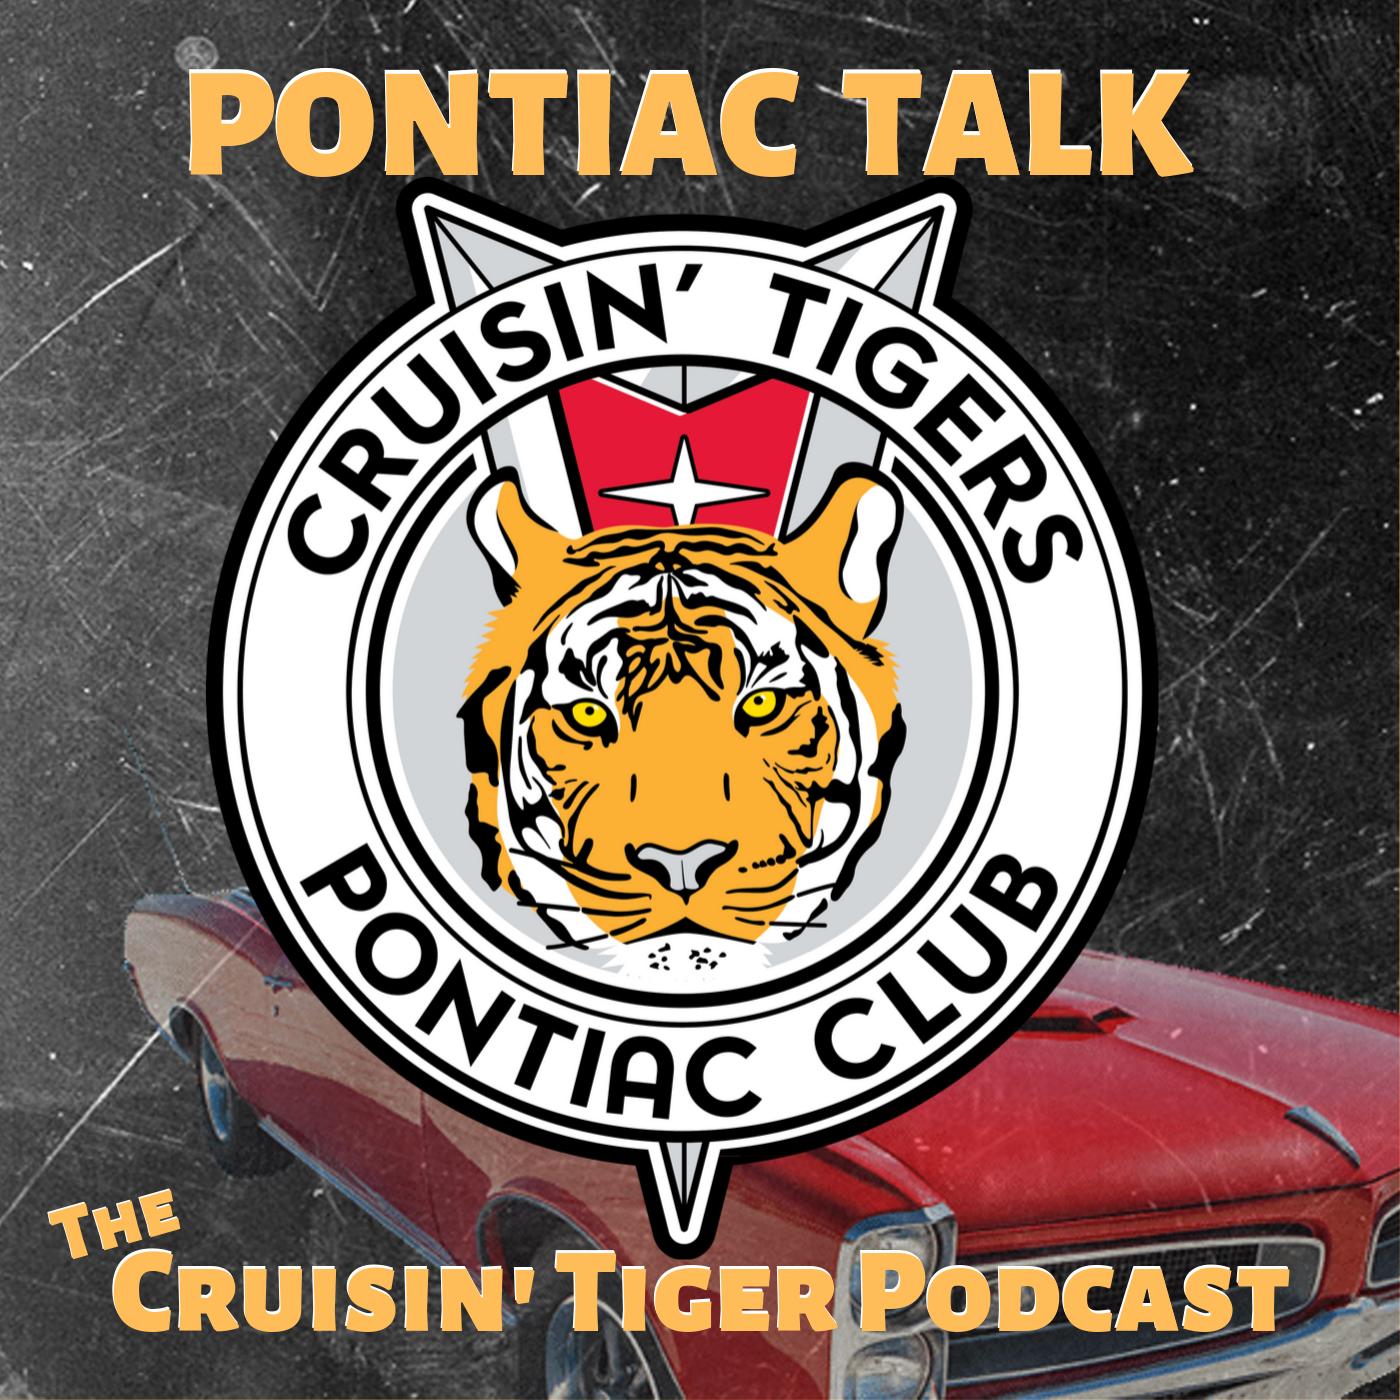 Pontiac Talk Podcast show art